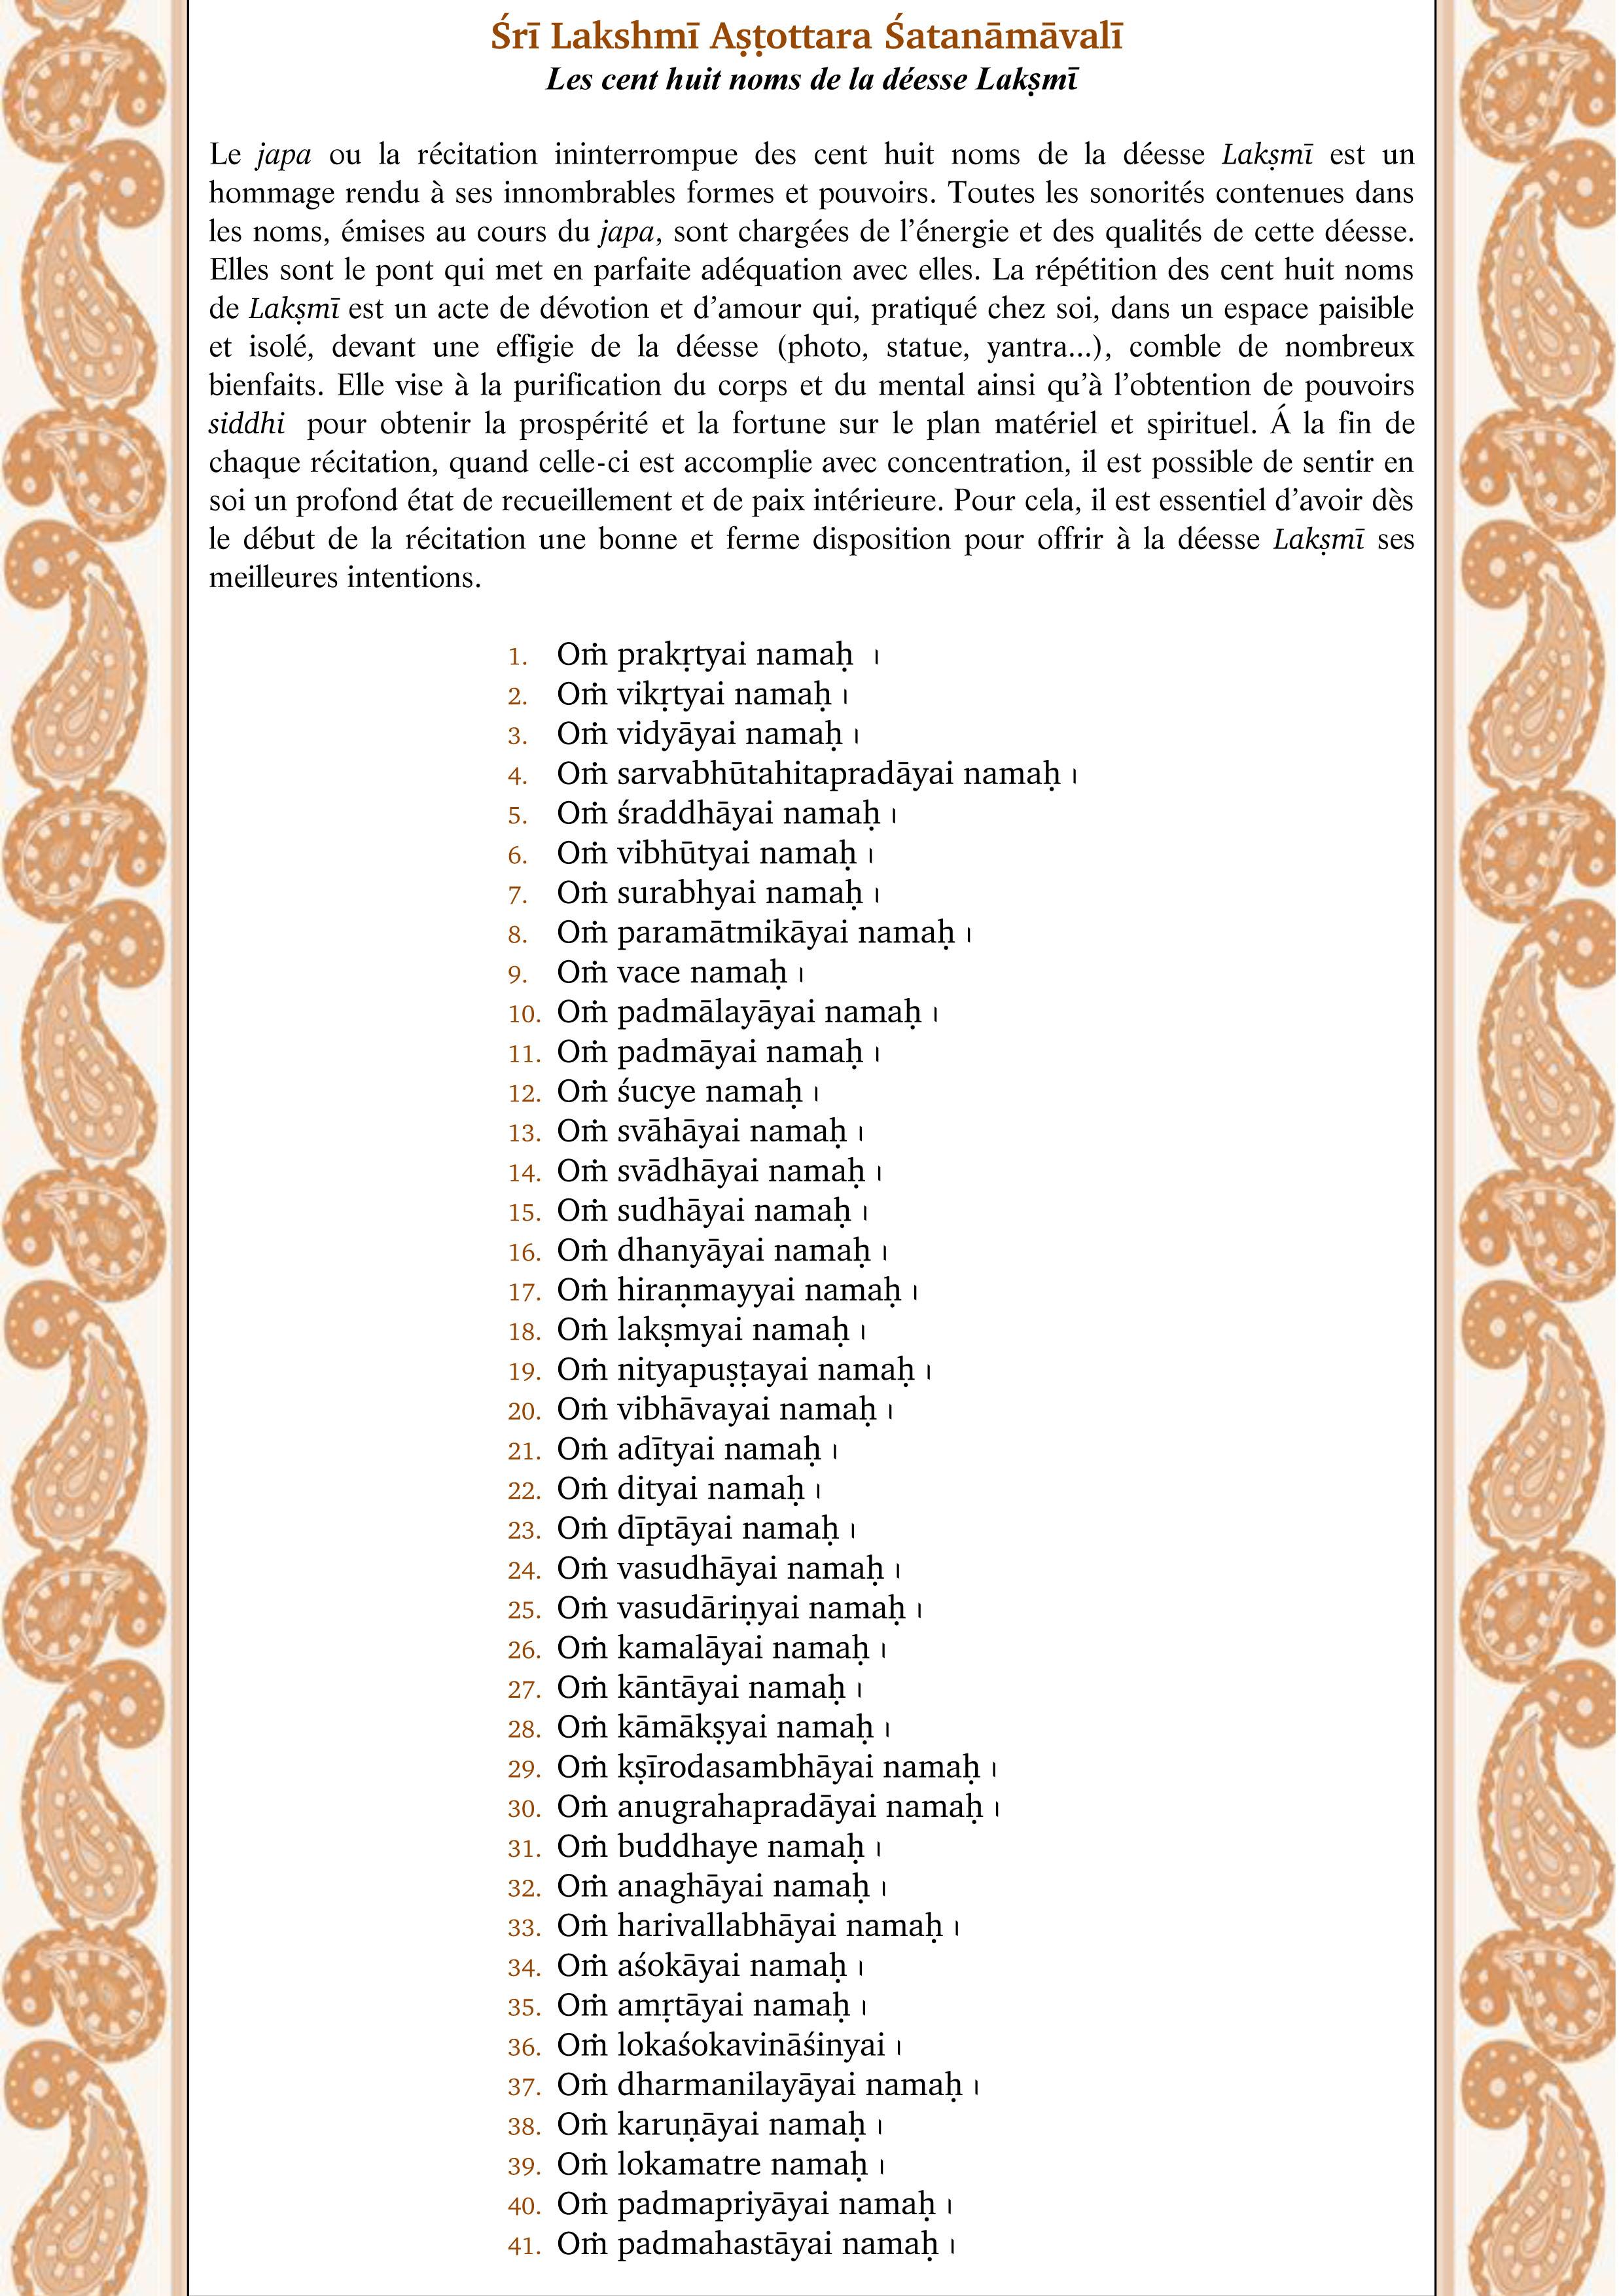 108 noms Lakshmi-1